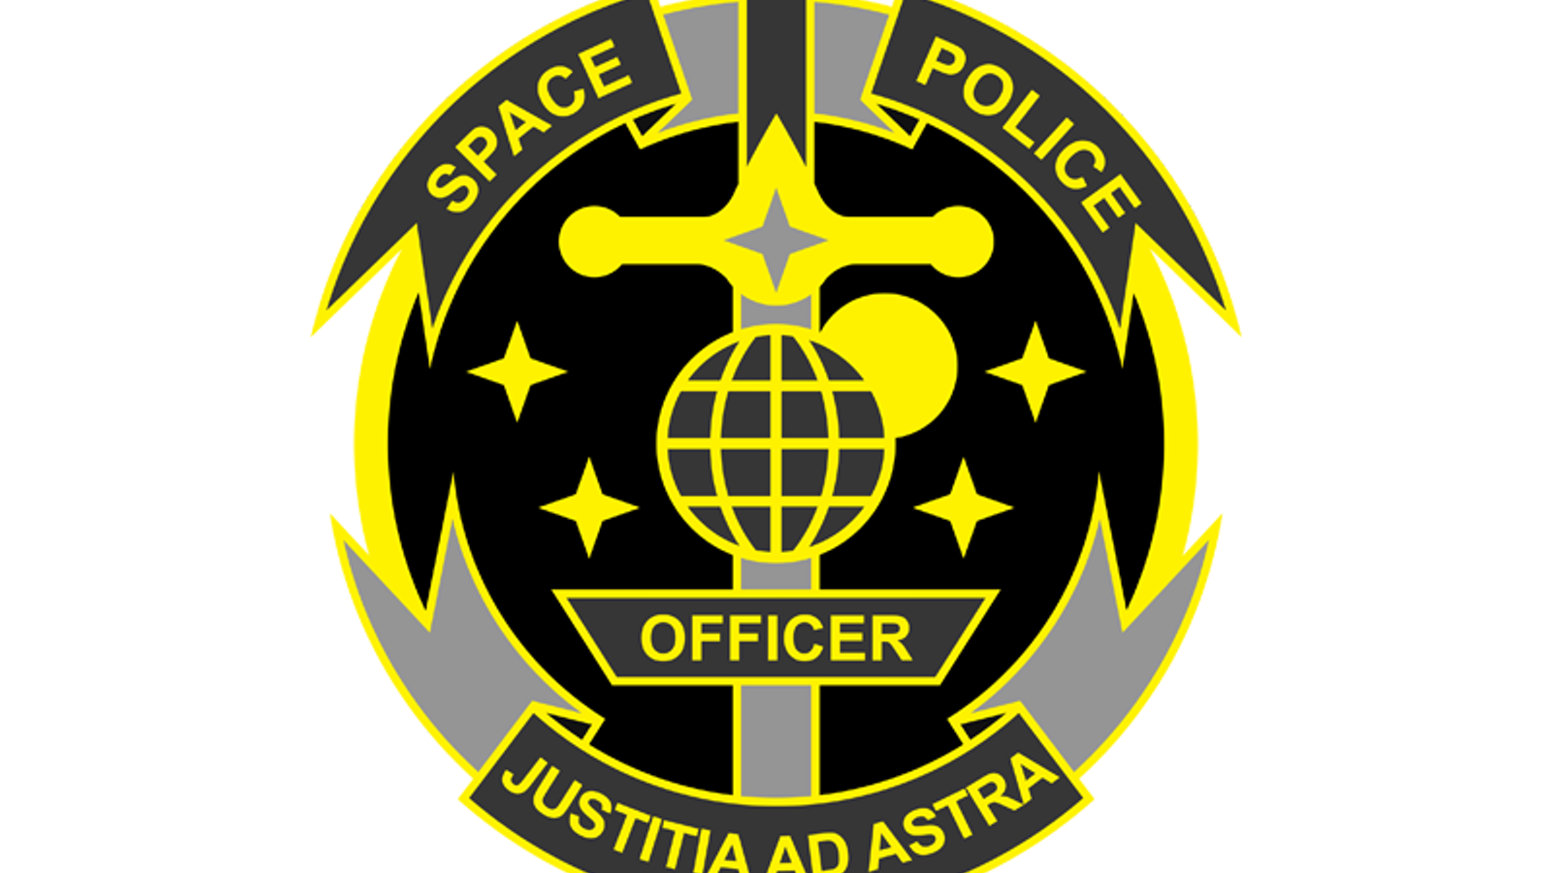 space police badges by david chen kickstarter